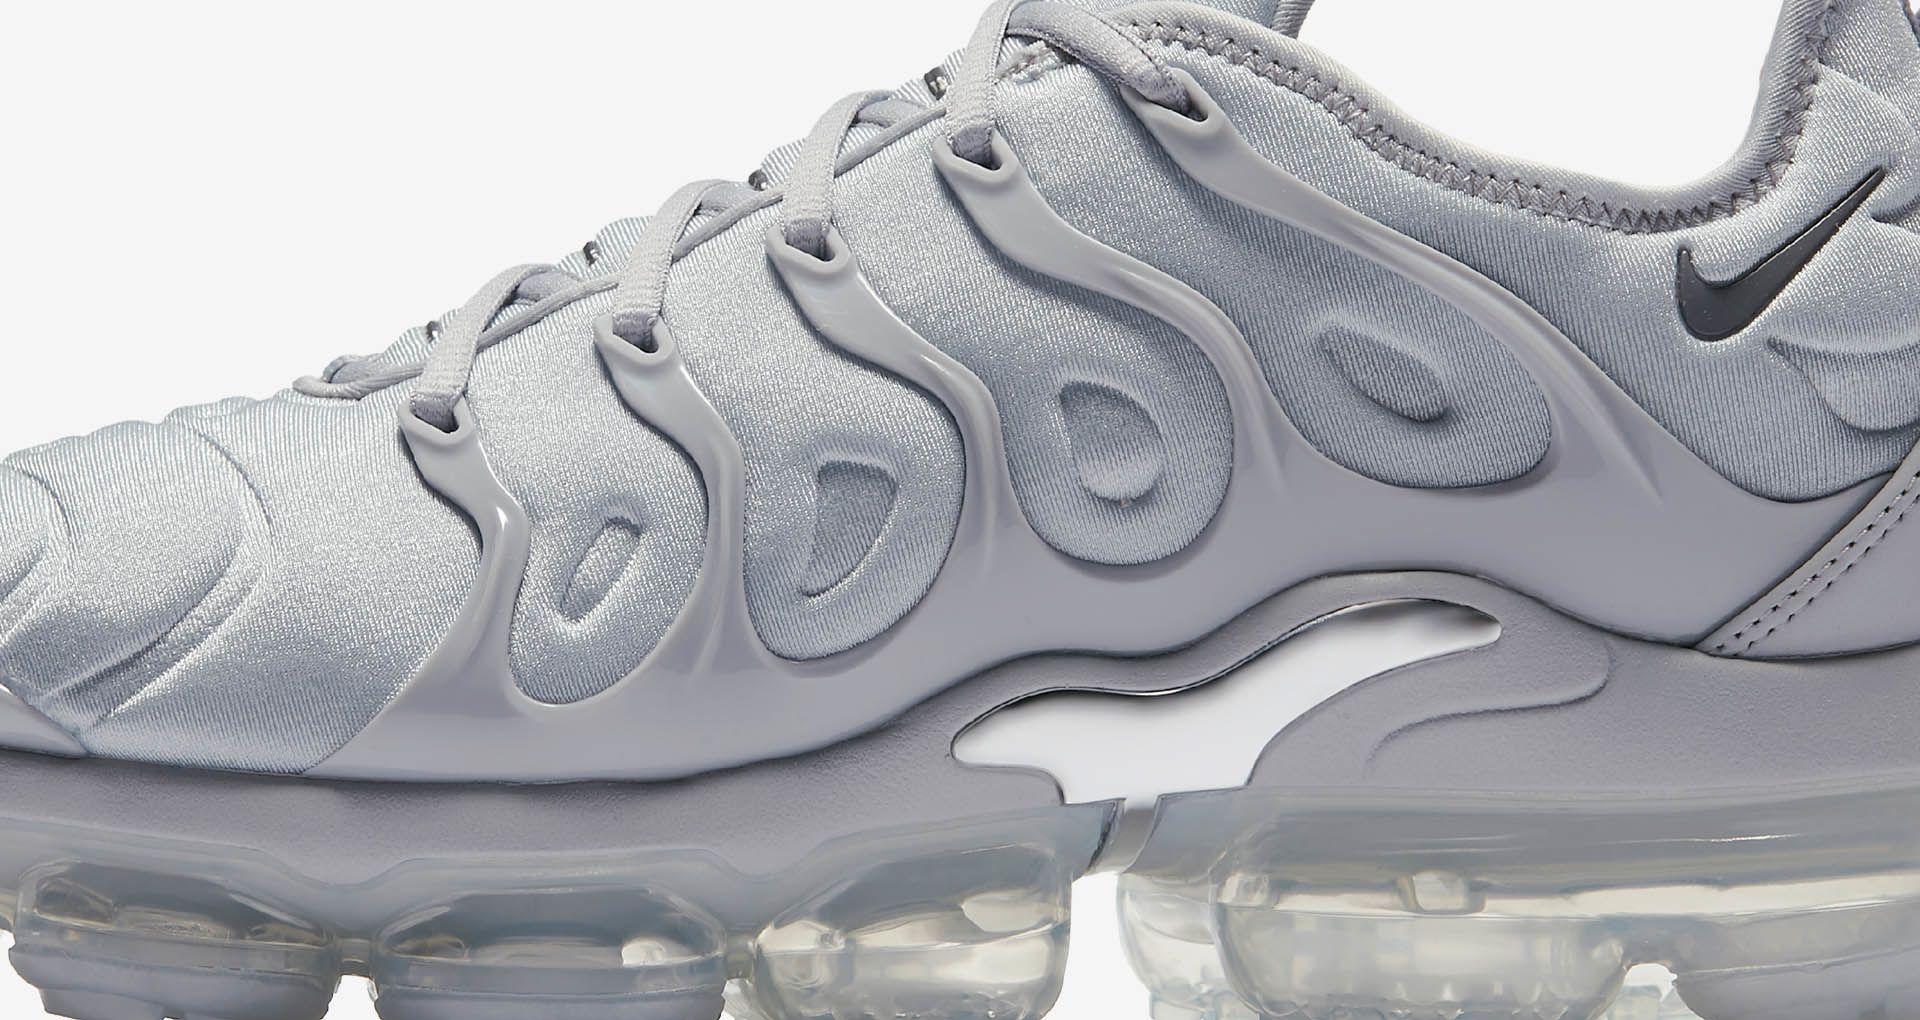 92753e417ee2 Nike Air Vapormax Plus  Cool Grey   Metallic Silver  Release Date ...